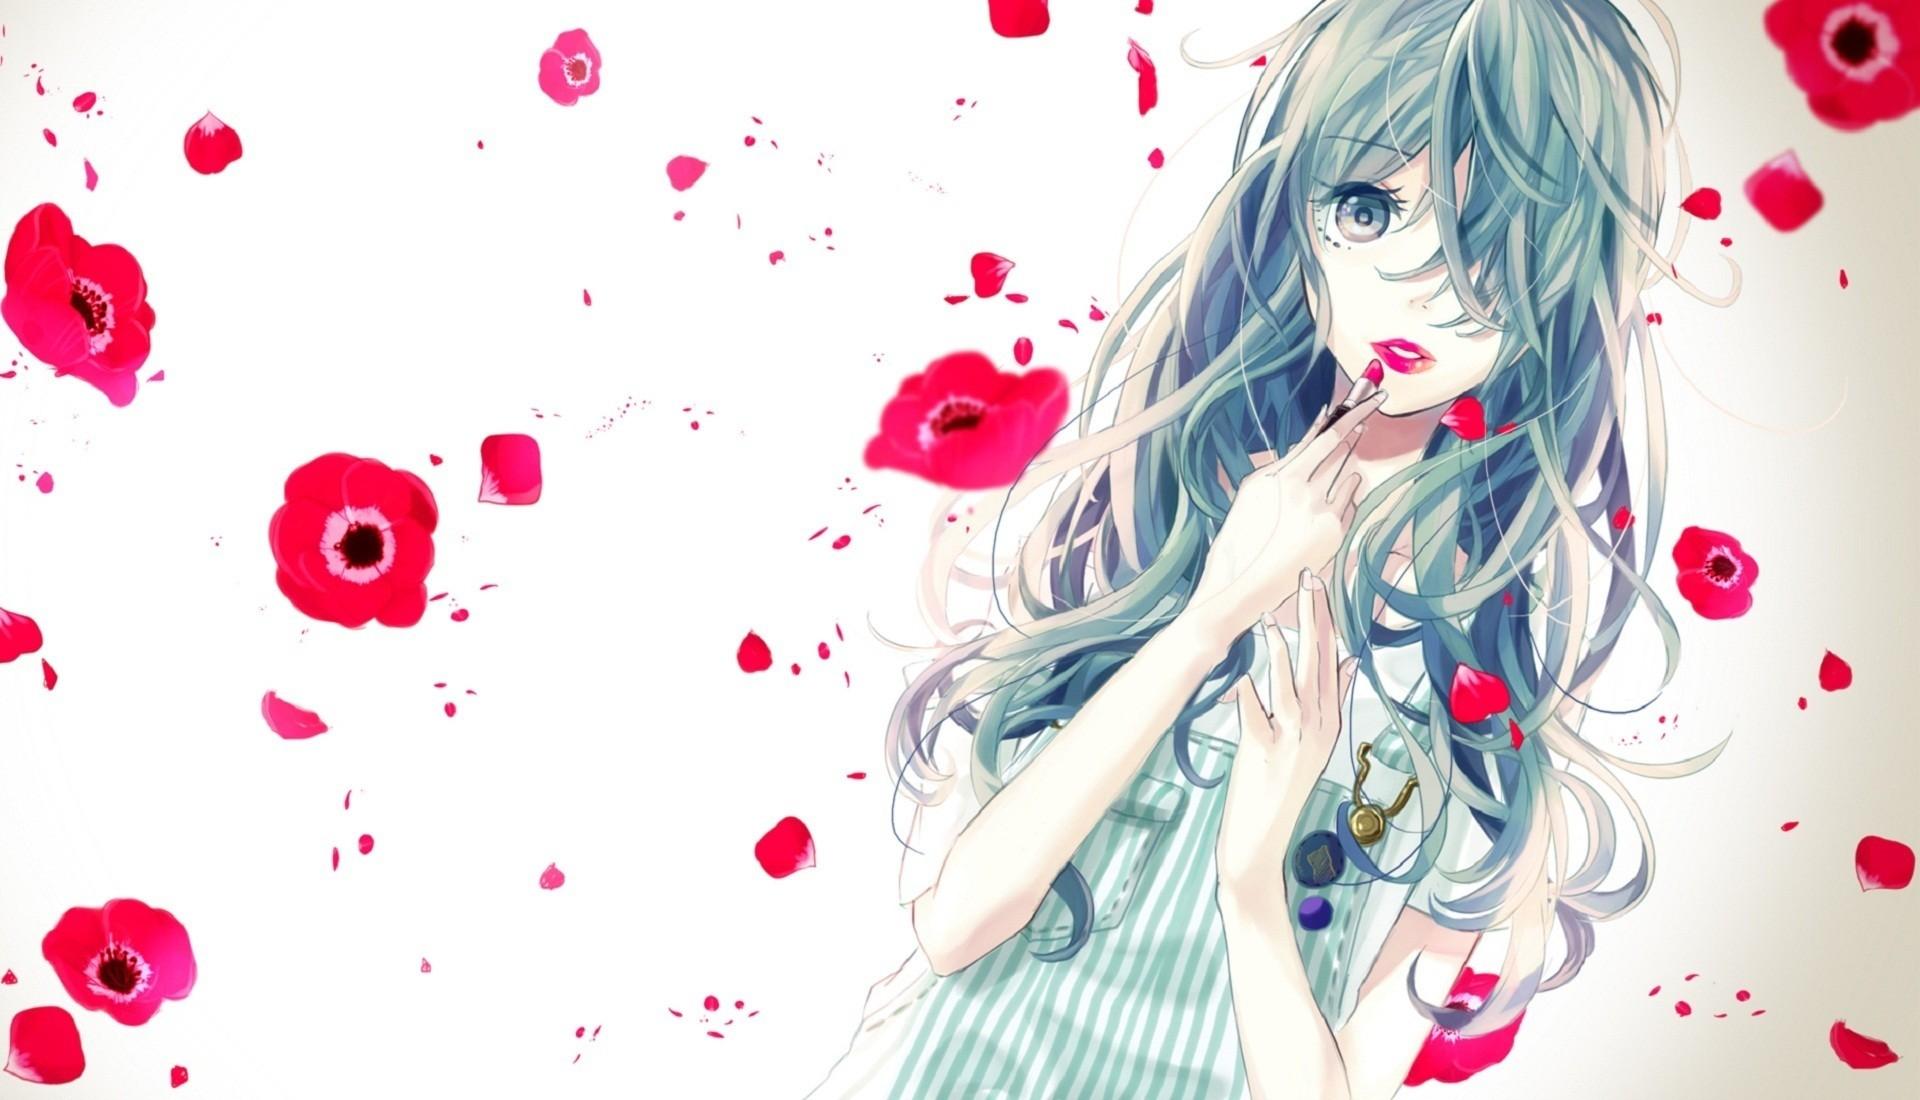 Cute couple anime desktop wallpaper